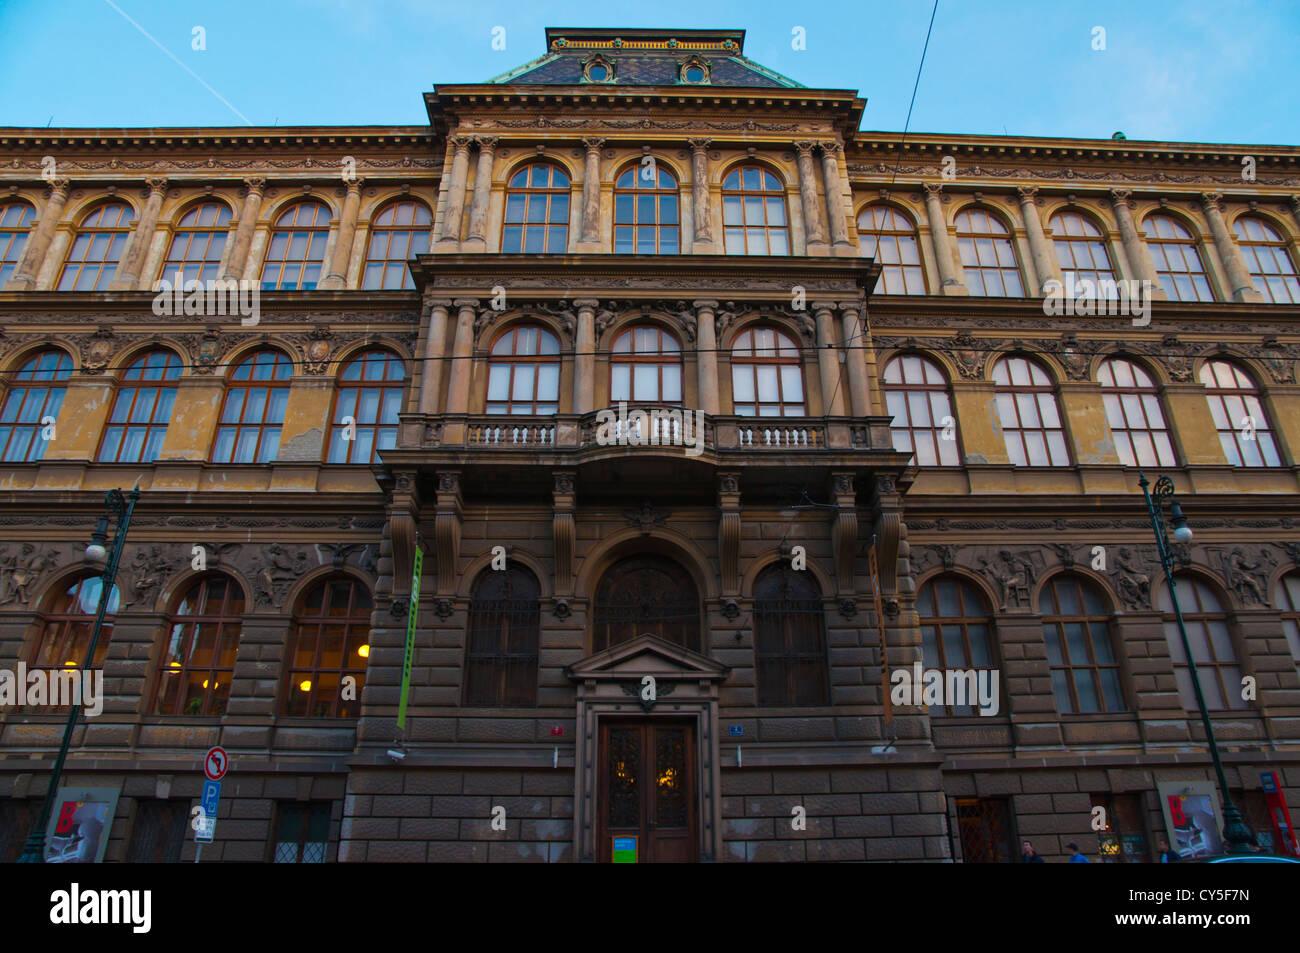 UPM Uměleckoprůmyslové museum v Praze il Museo di Arti Decorative costruendo città vecchia Praga Repubblica Immagini Stock